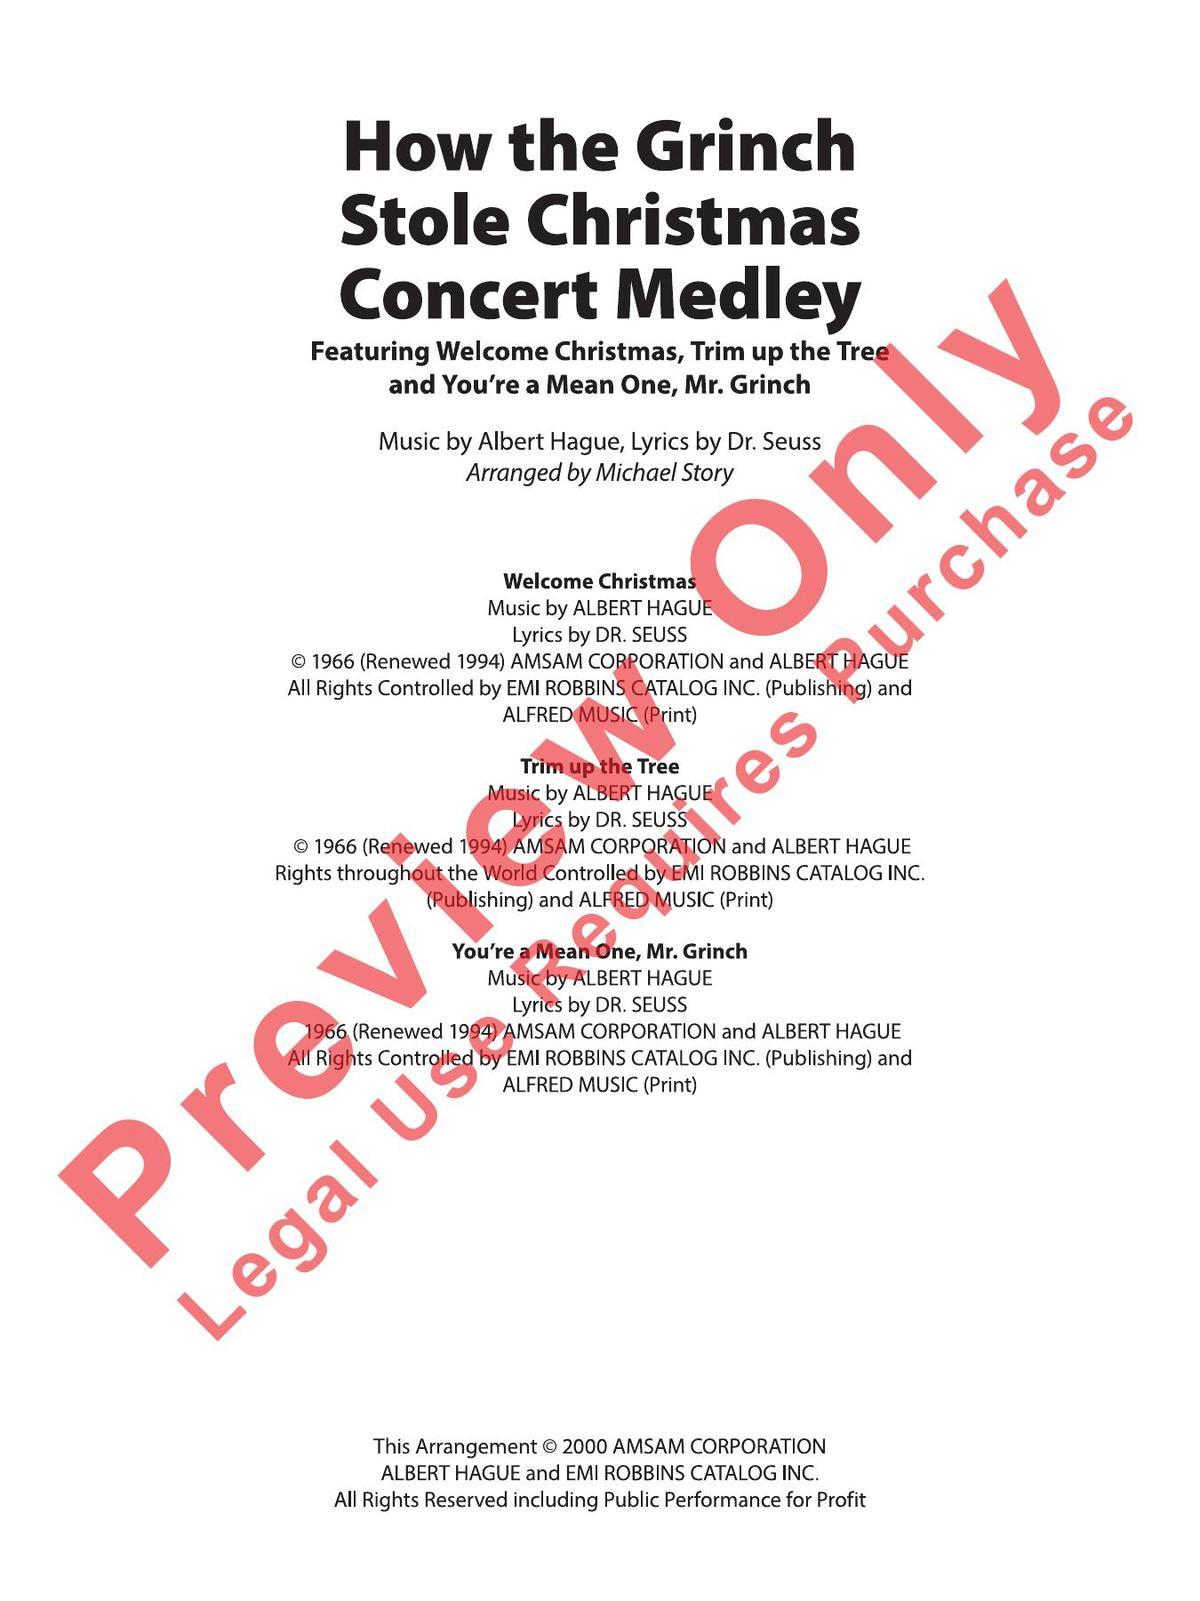 How The Grinch Stole Christmas Lyrics.Dvo Druck Und Verlag Obermayer Gmbh